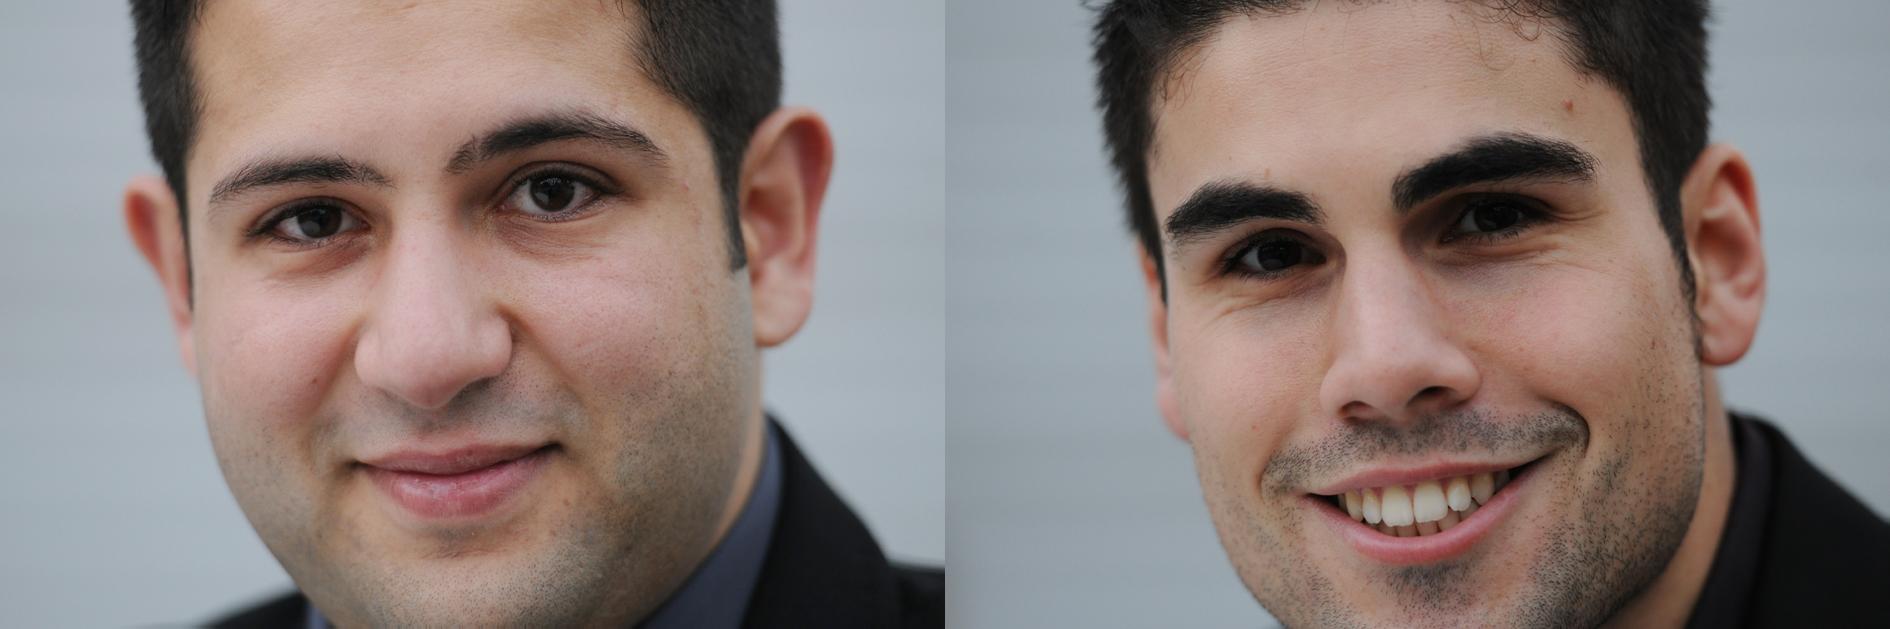 Mohamad Ali El Chaikh Ali (l) und Ulas Kalayci. Foto: Hertie-Stiftung/Pedro Citoler ©